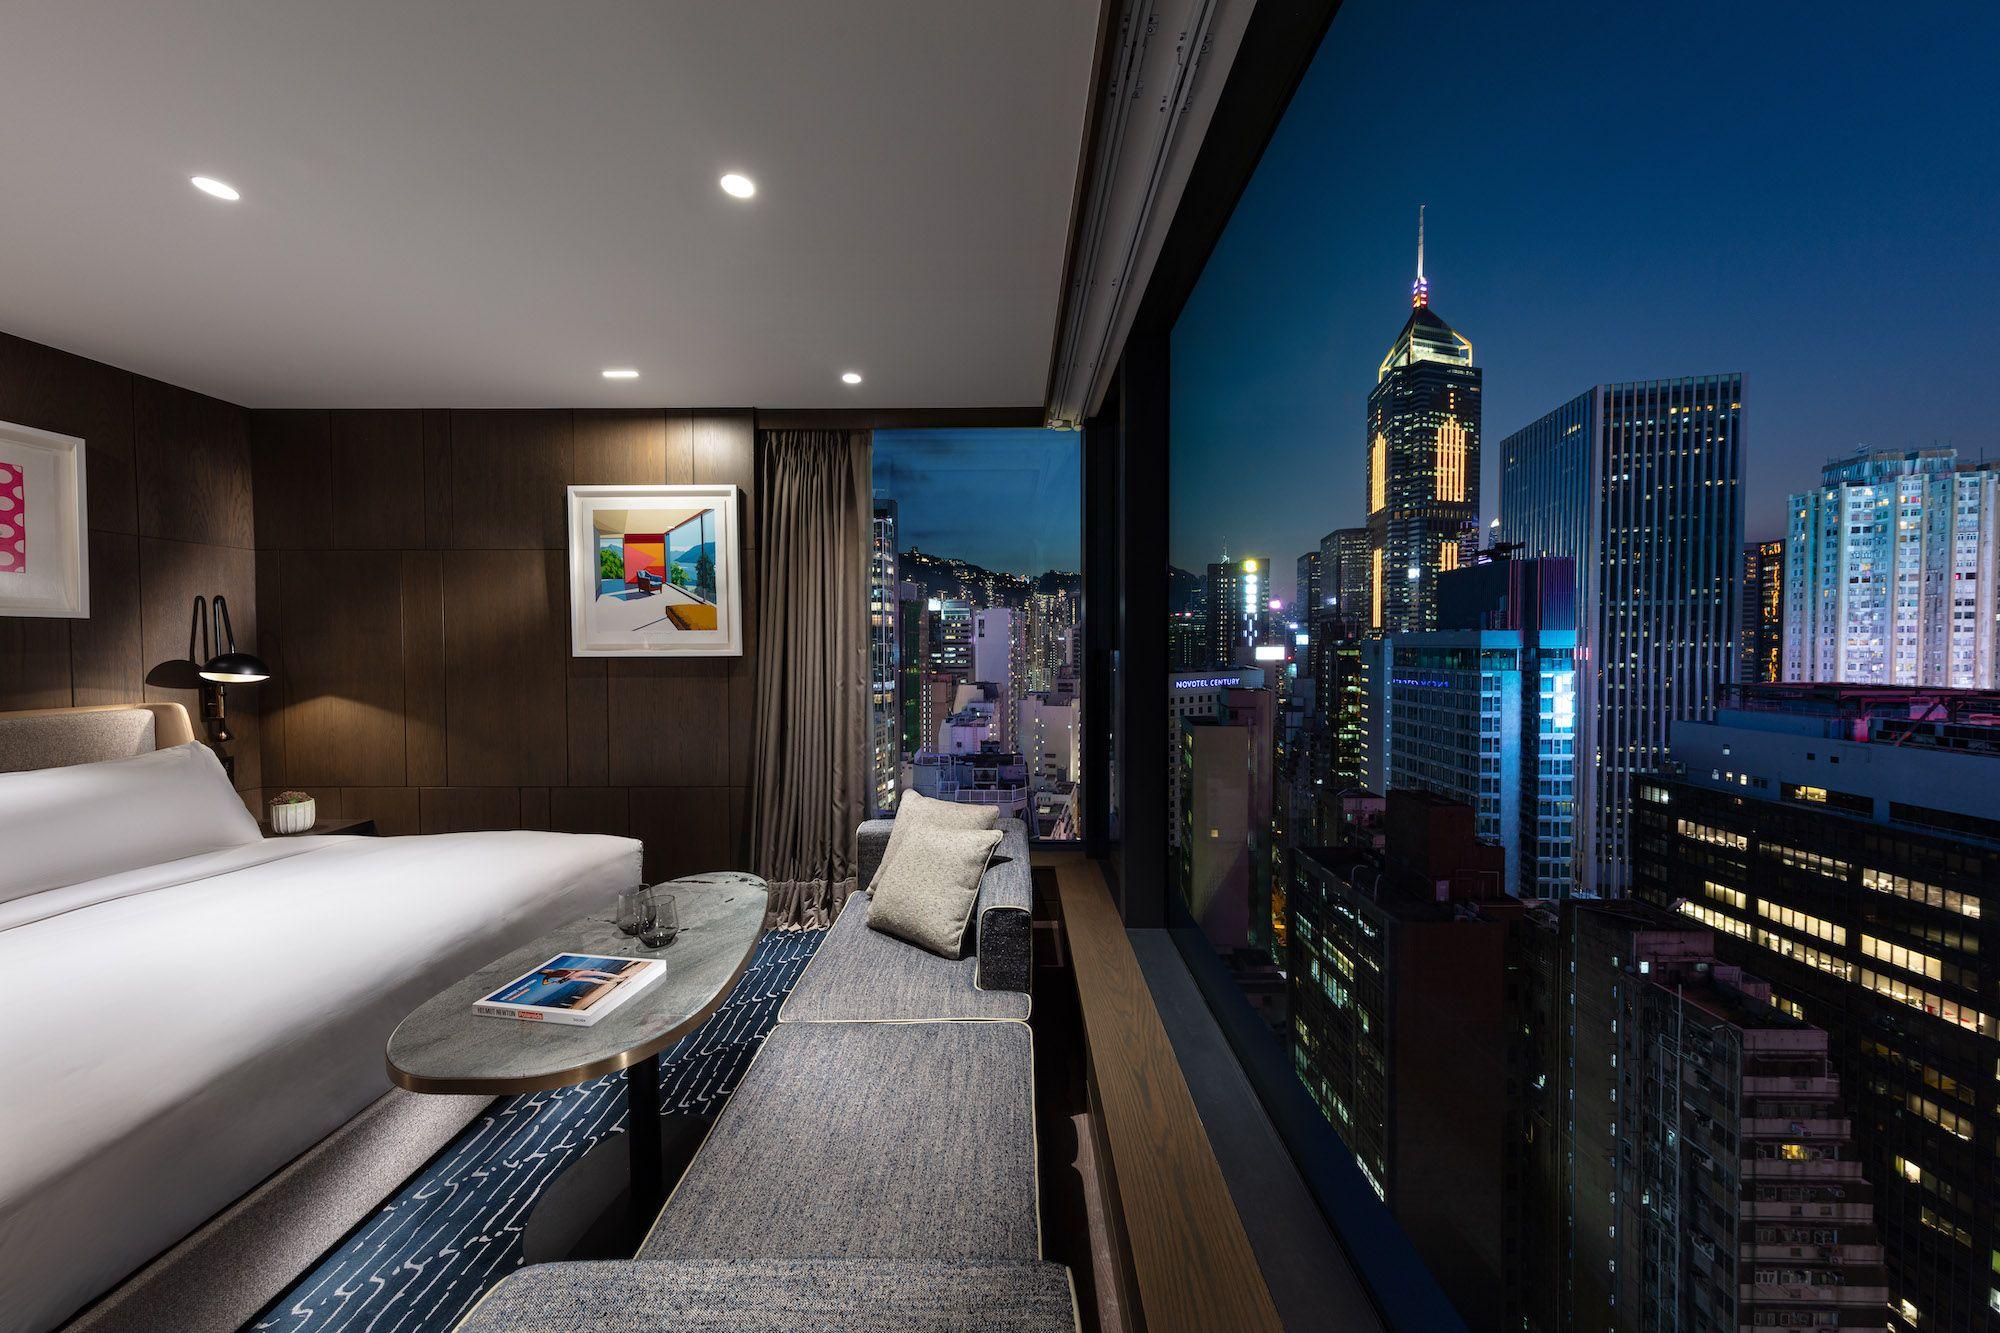 First Look: The Hari Hong Kong Opens This December 2020